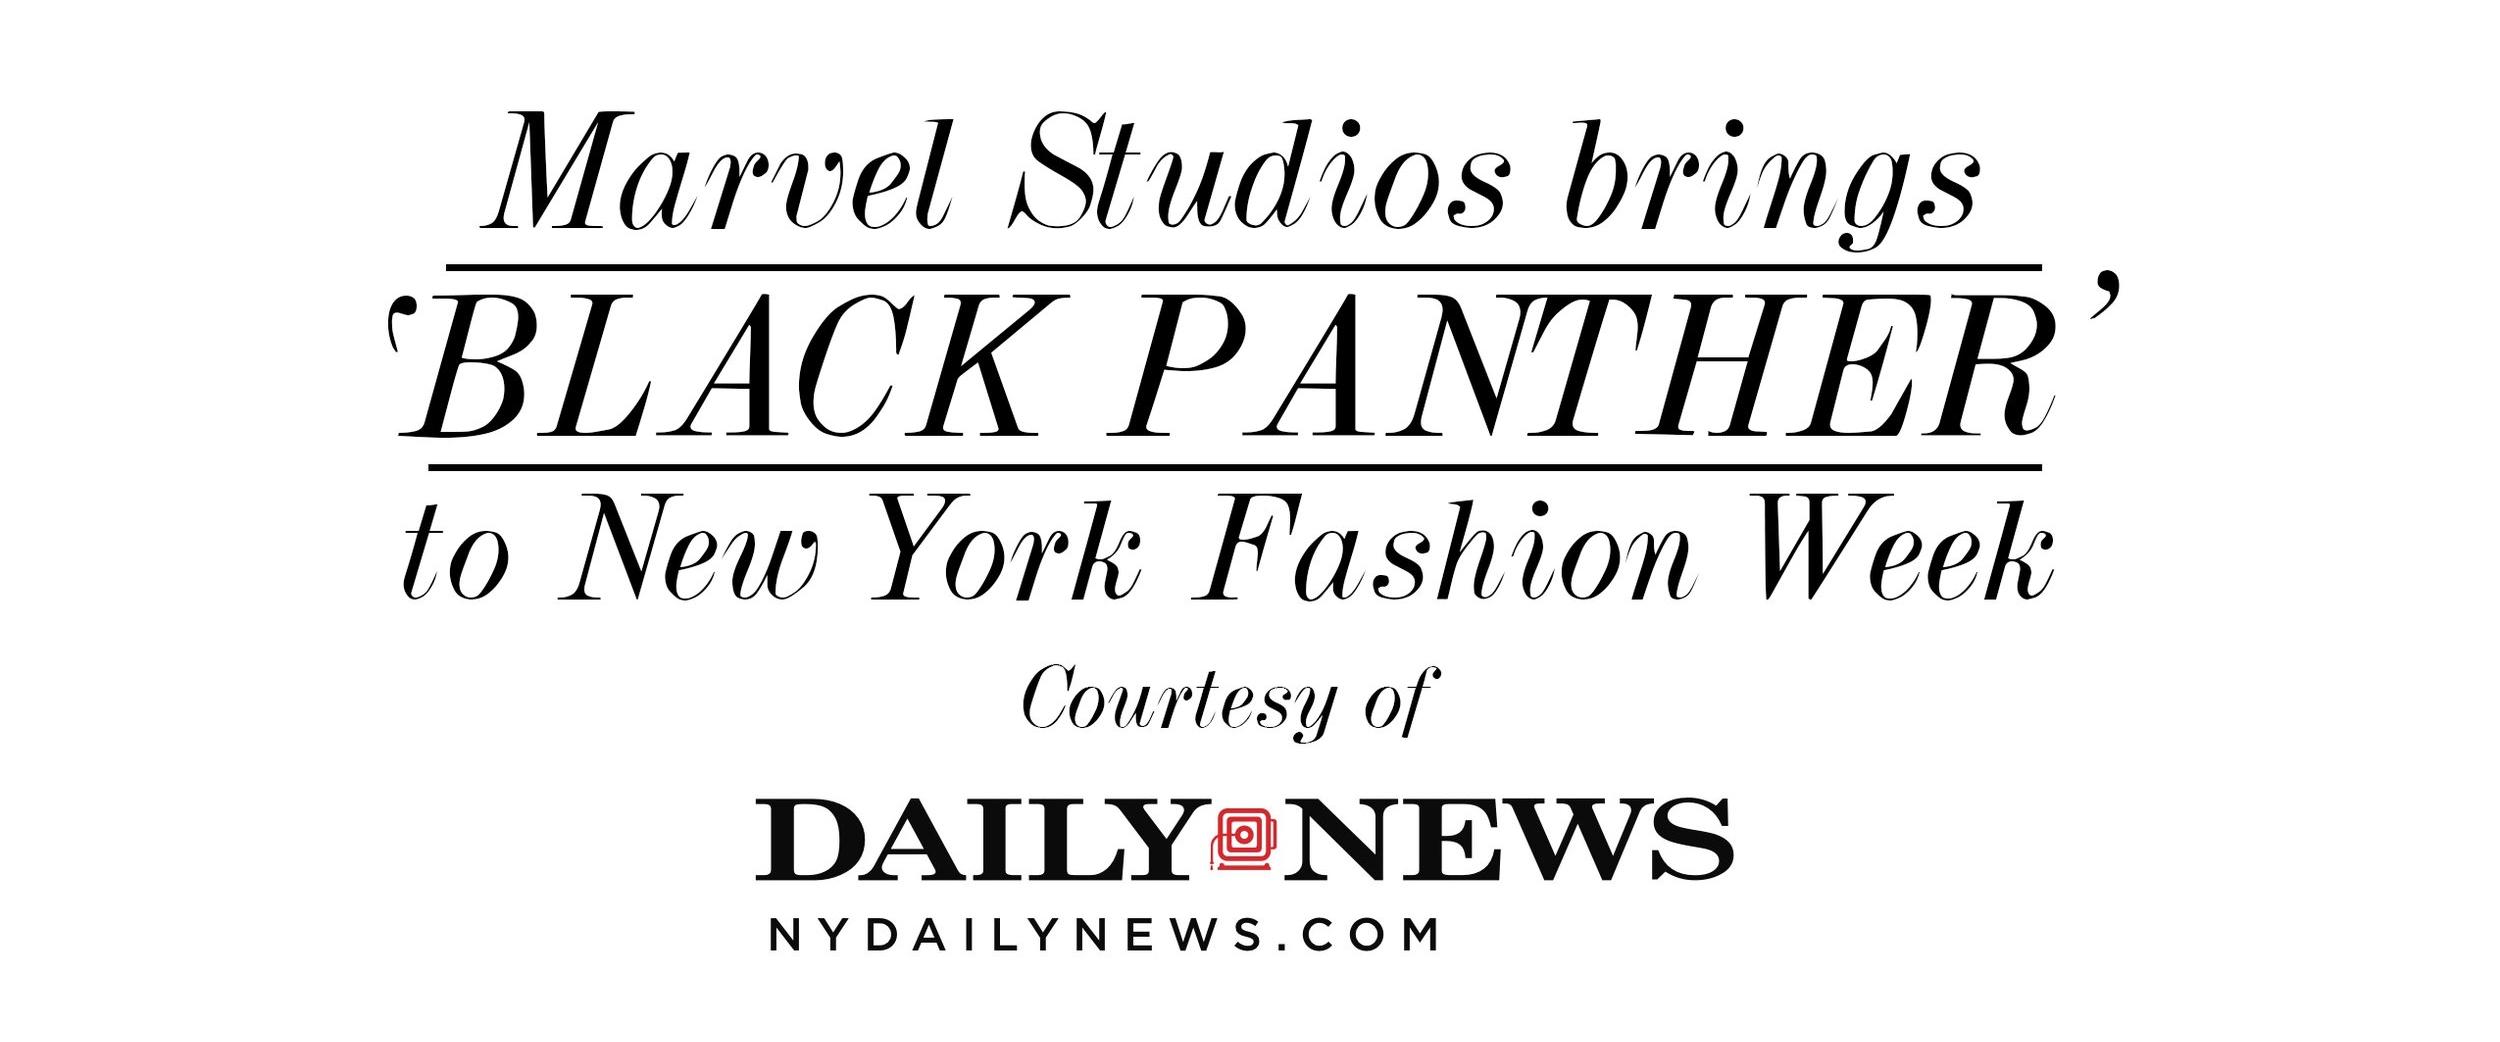 BLACK_pANTHER_ny_fw.jpg